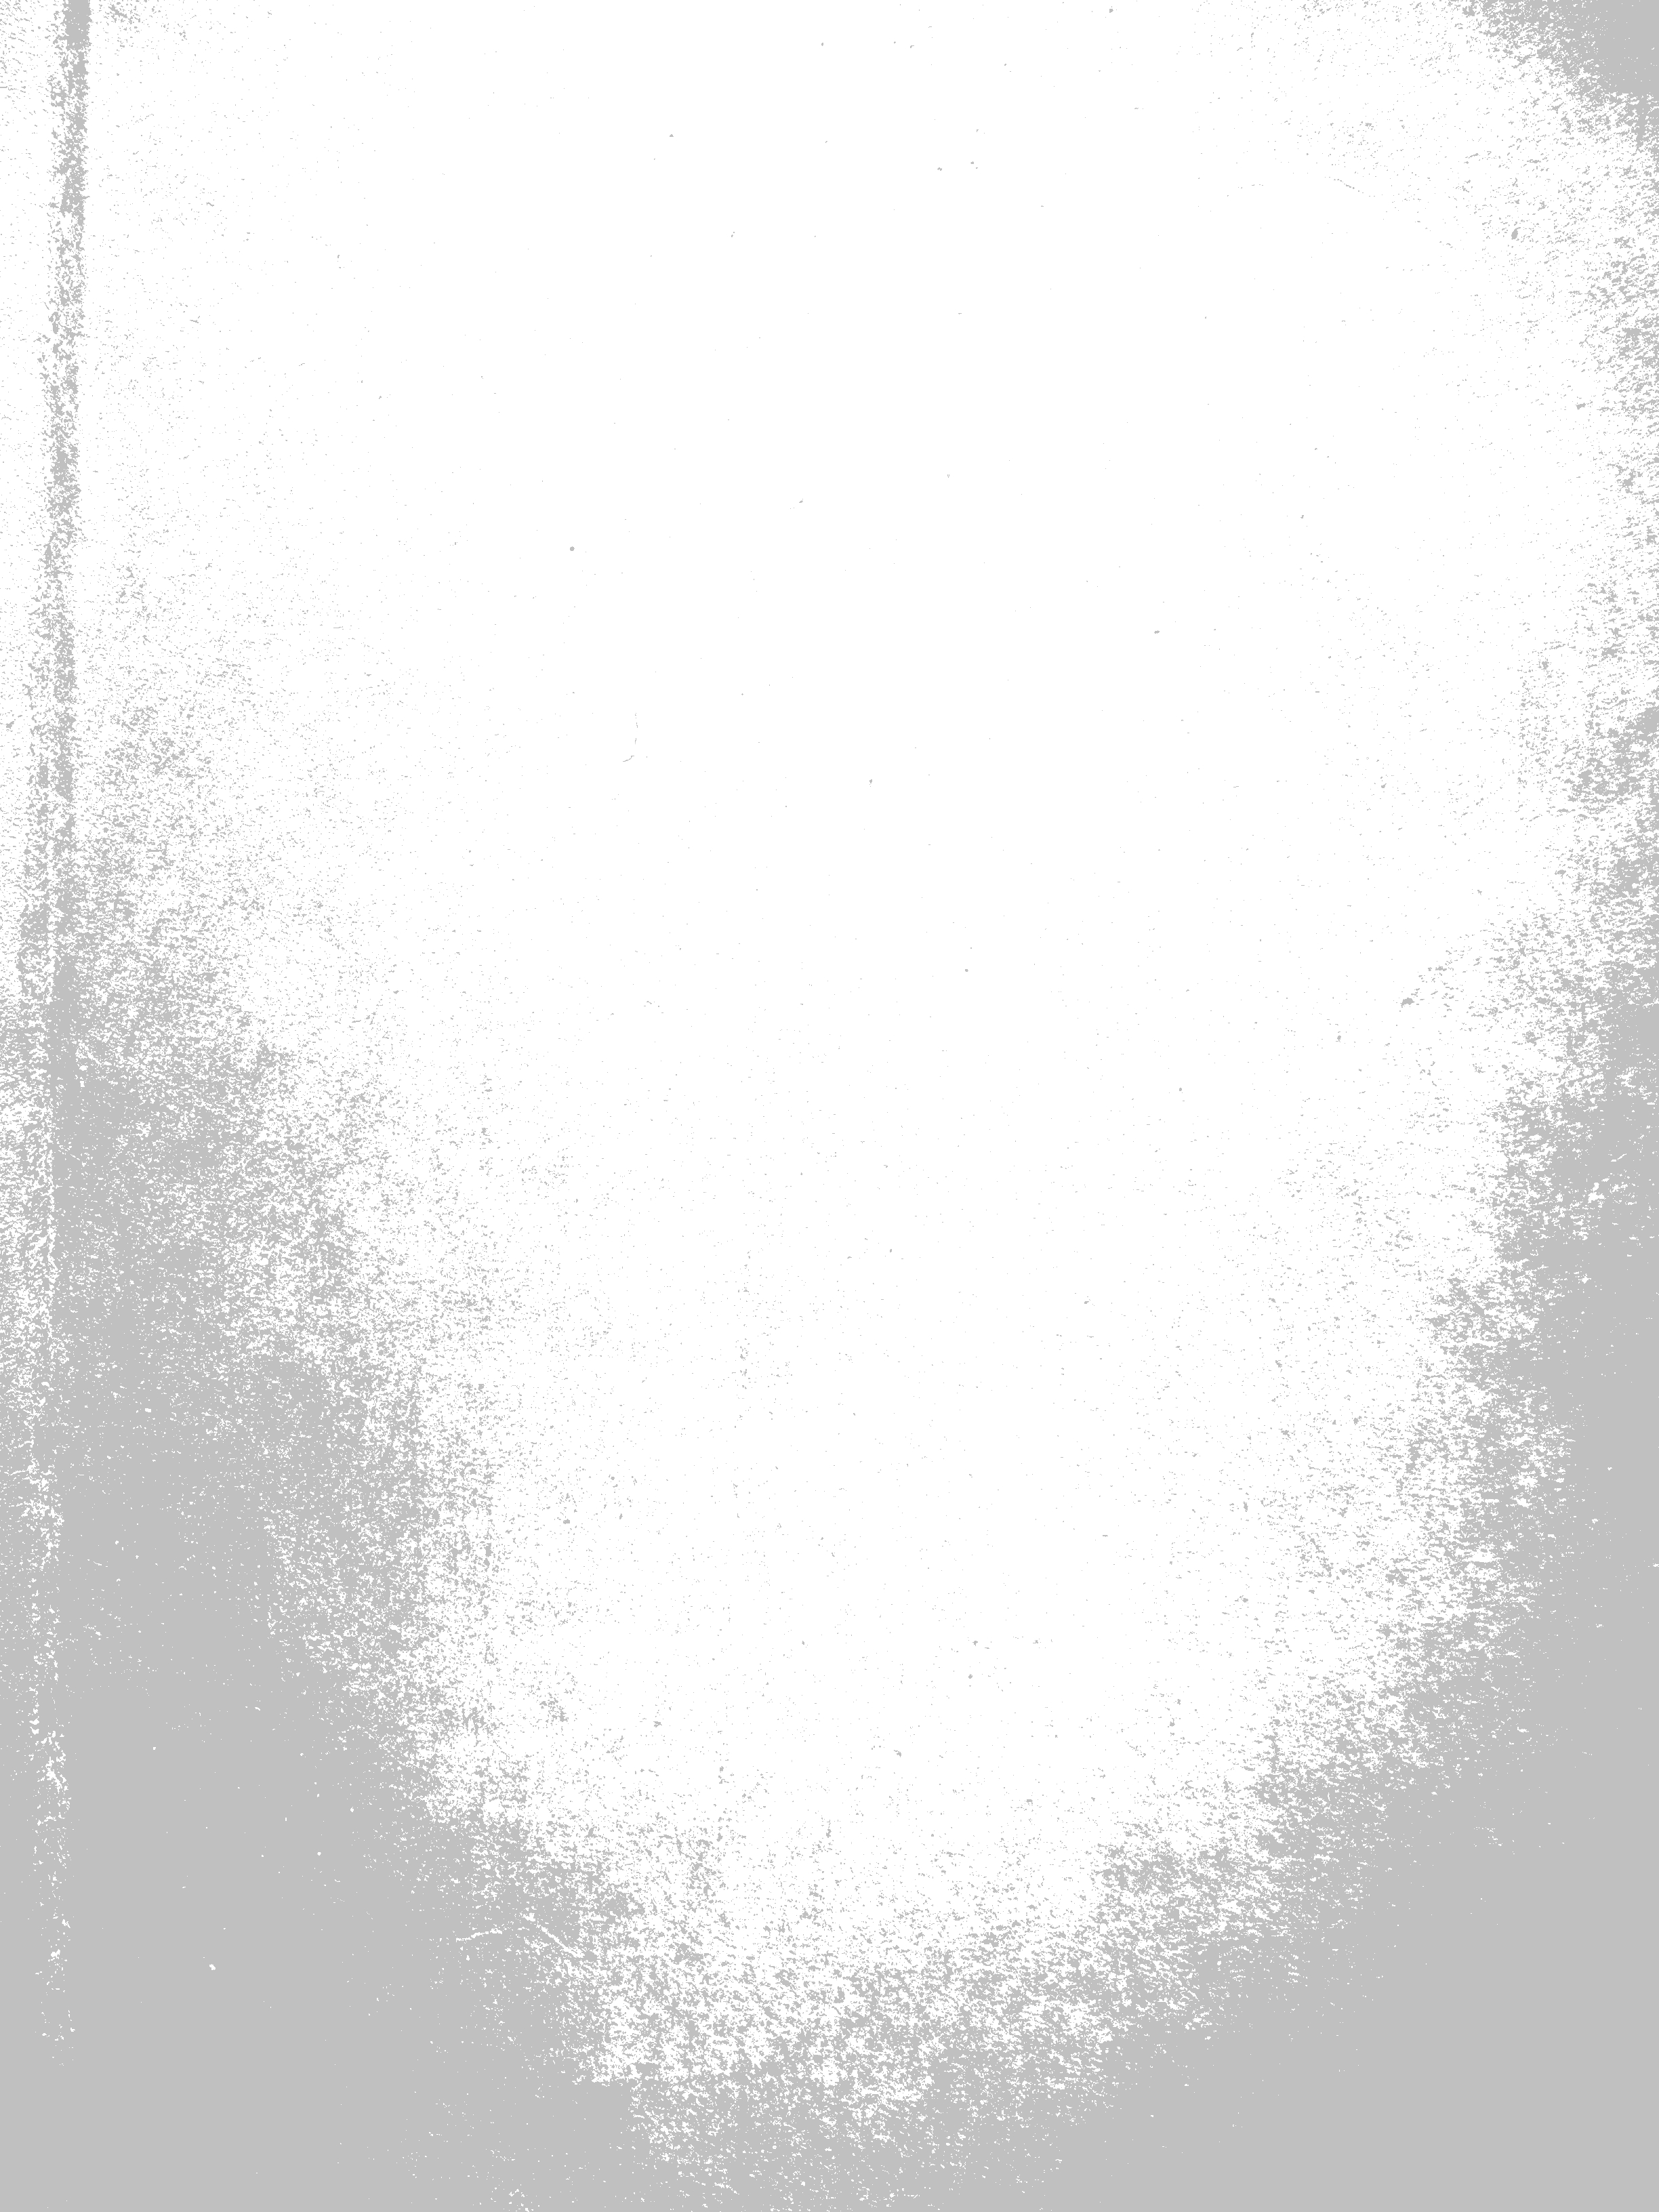 noise_texture.jpg